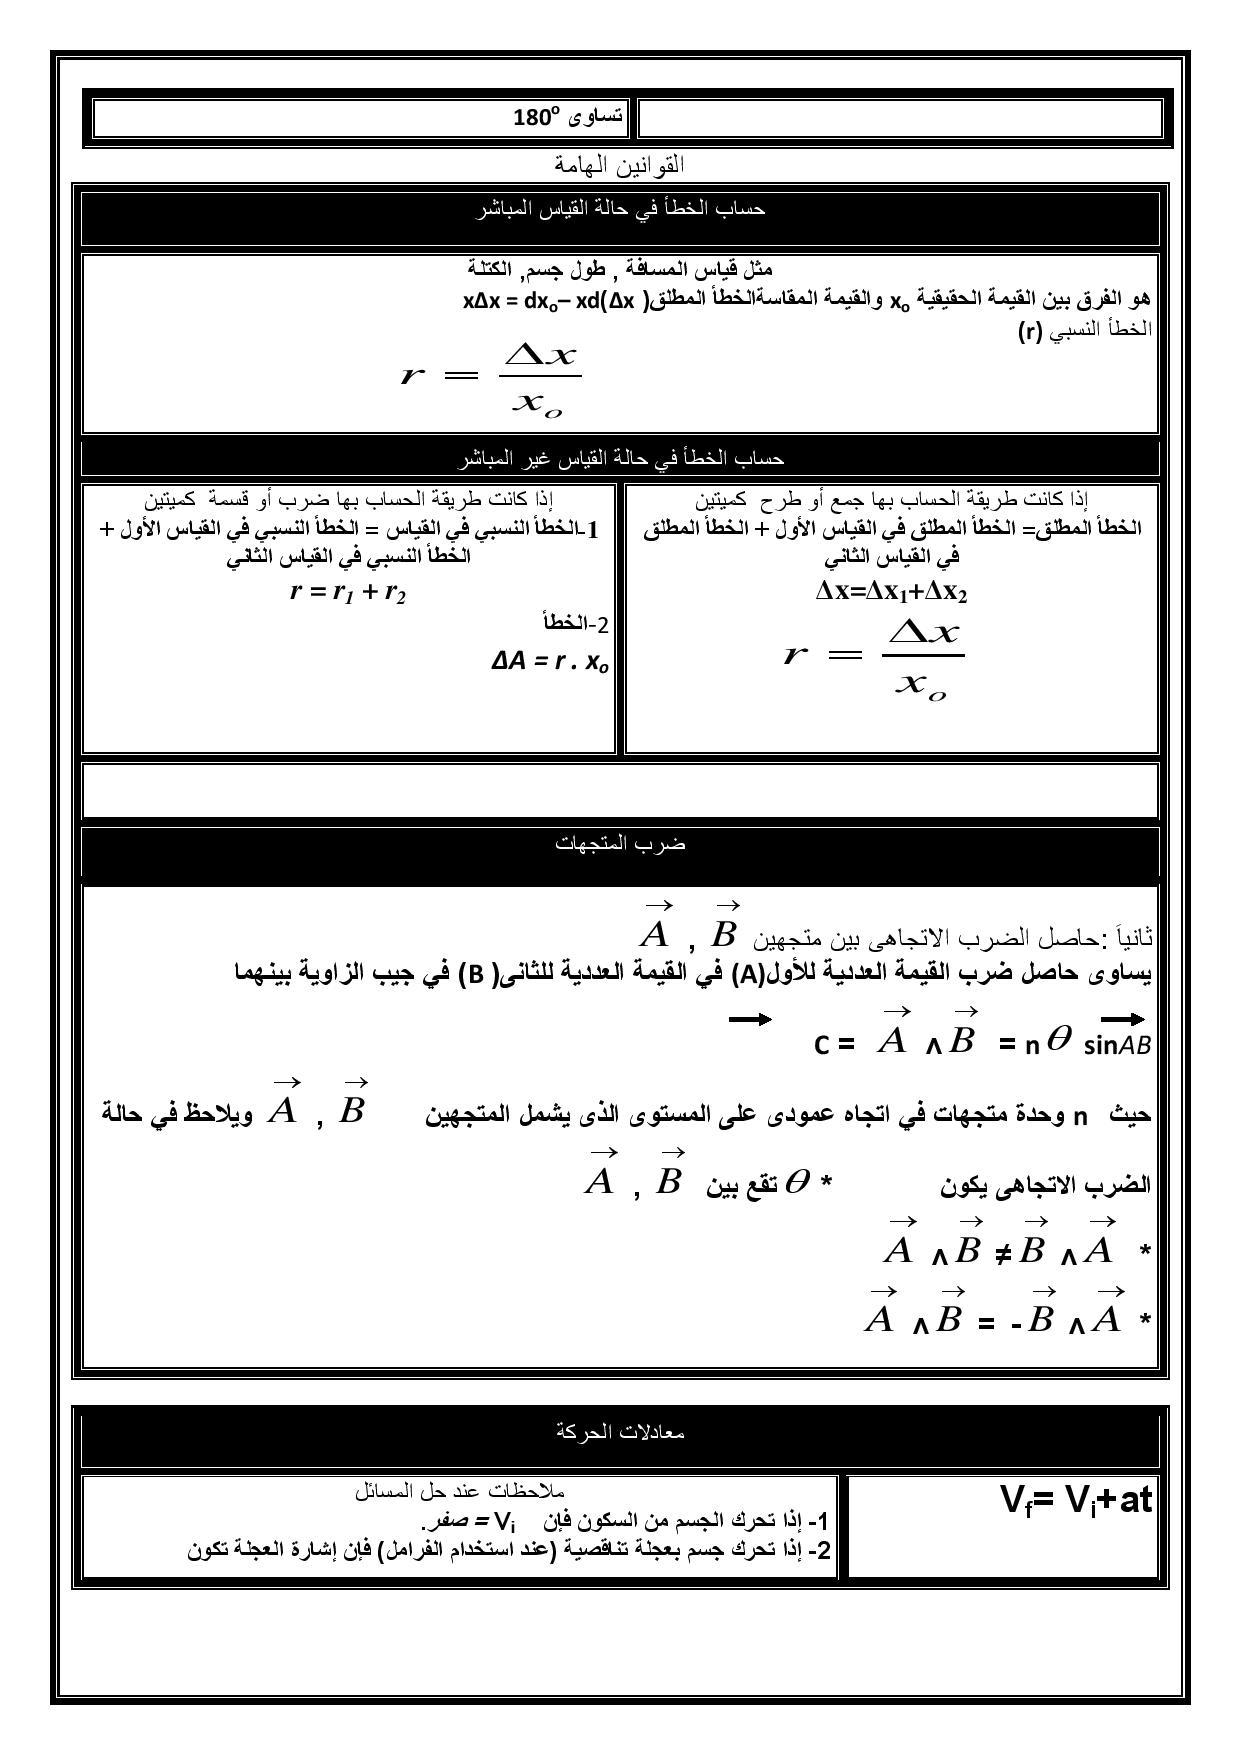 exam-eg.com_1462977506484.jpg